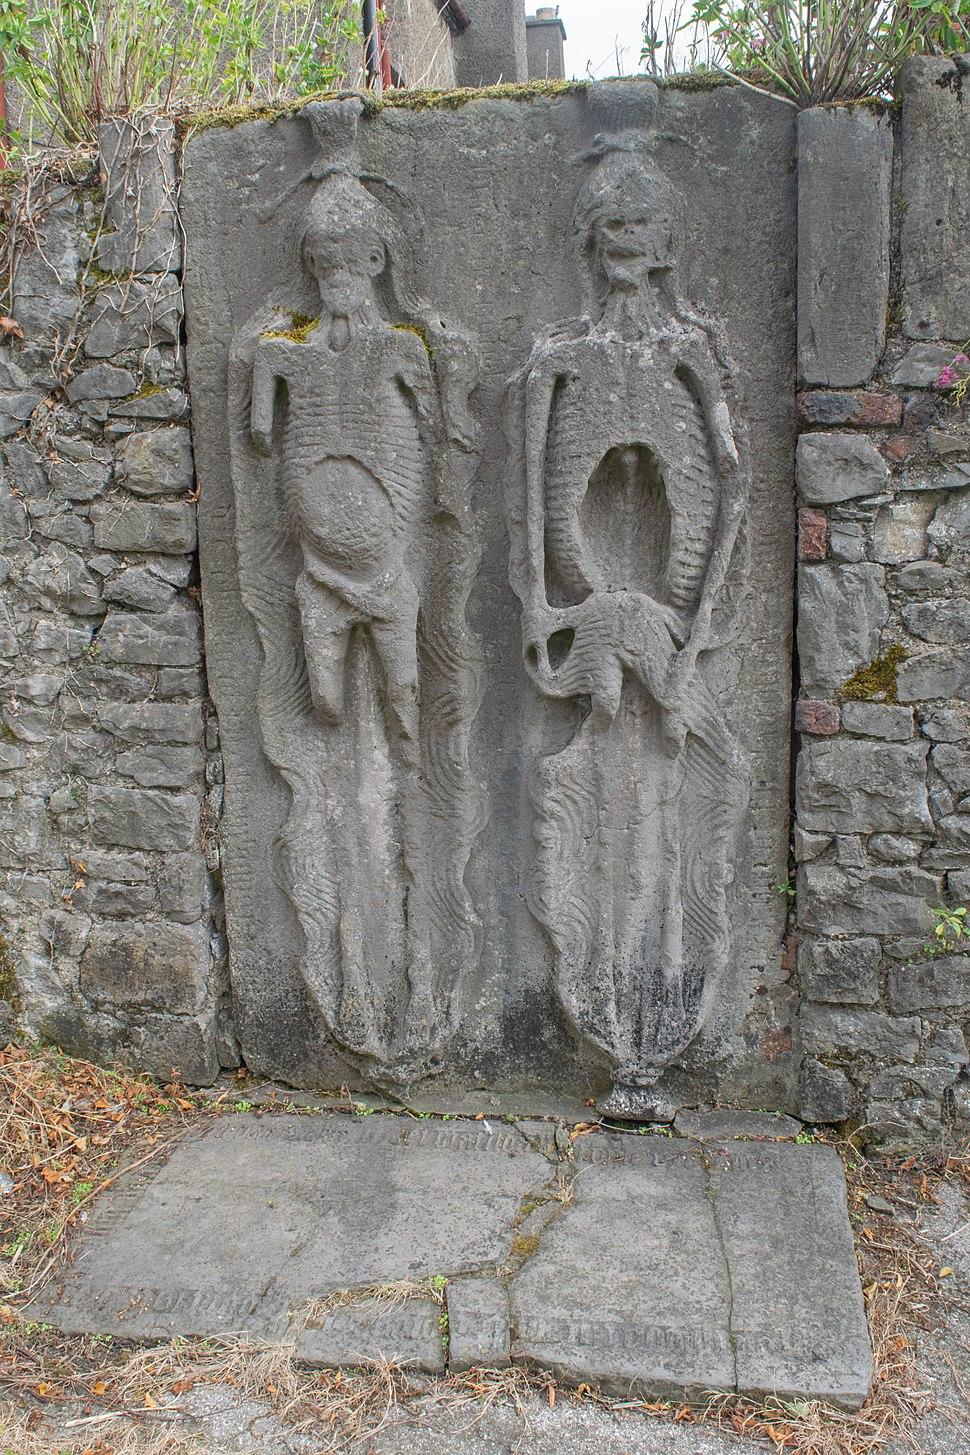 Cadaver stone in St. Peter's churchyard, Drogheda, Ireland